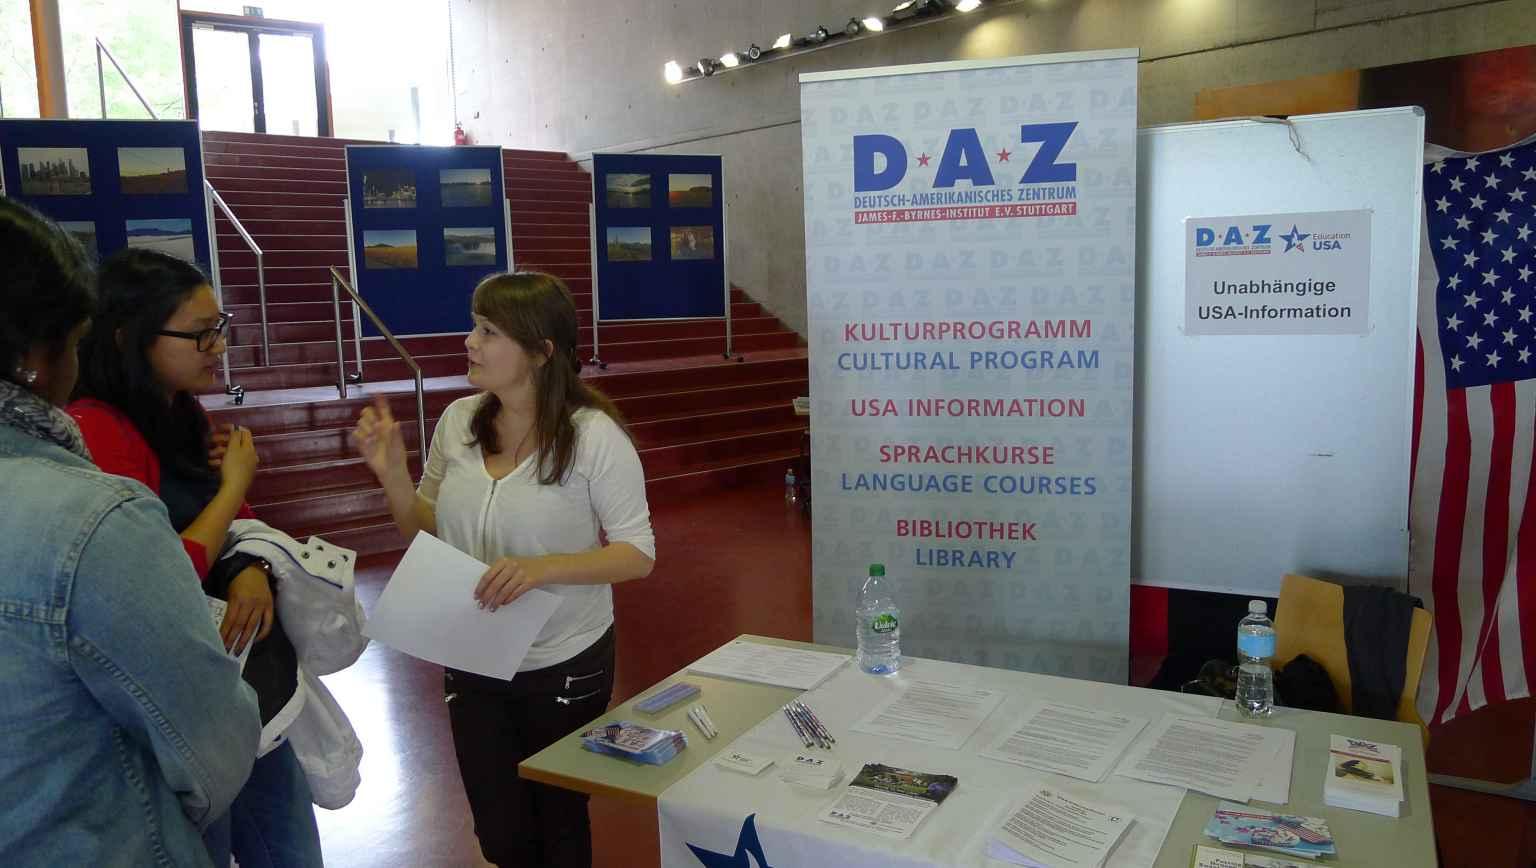 DAZ Stuttgart - EducationUSA